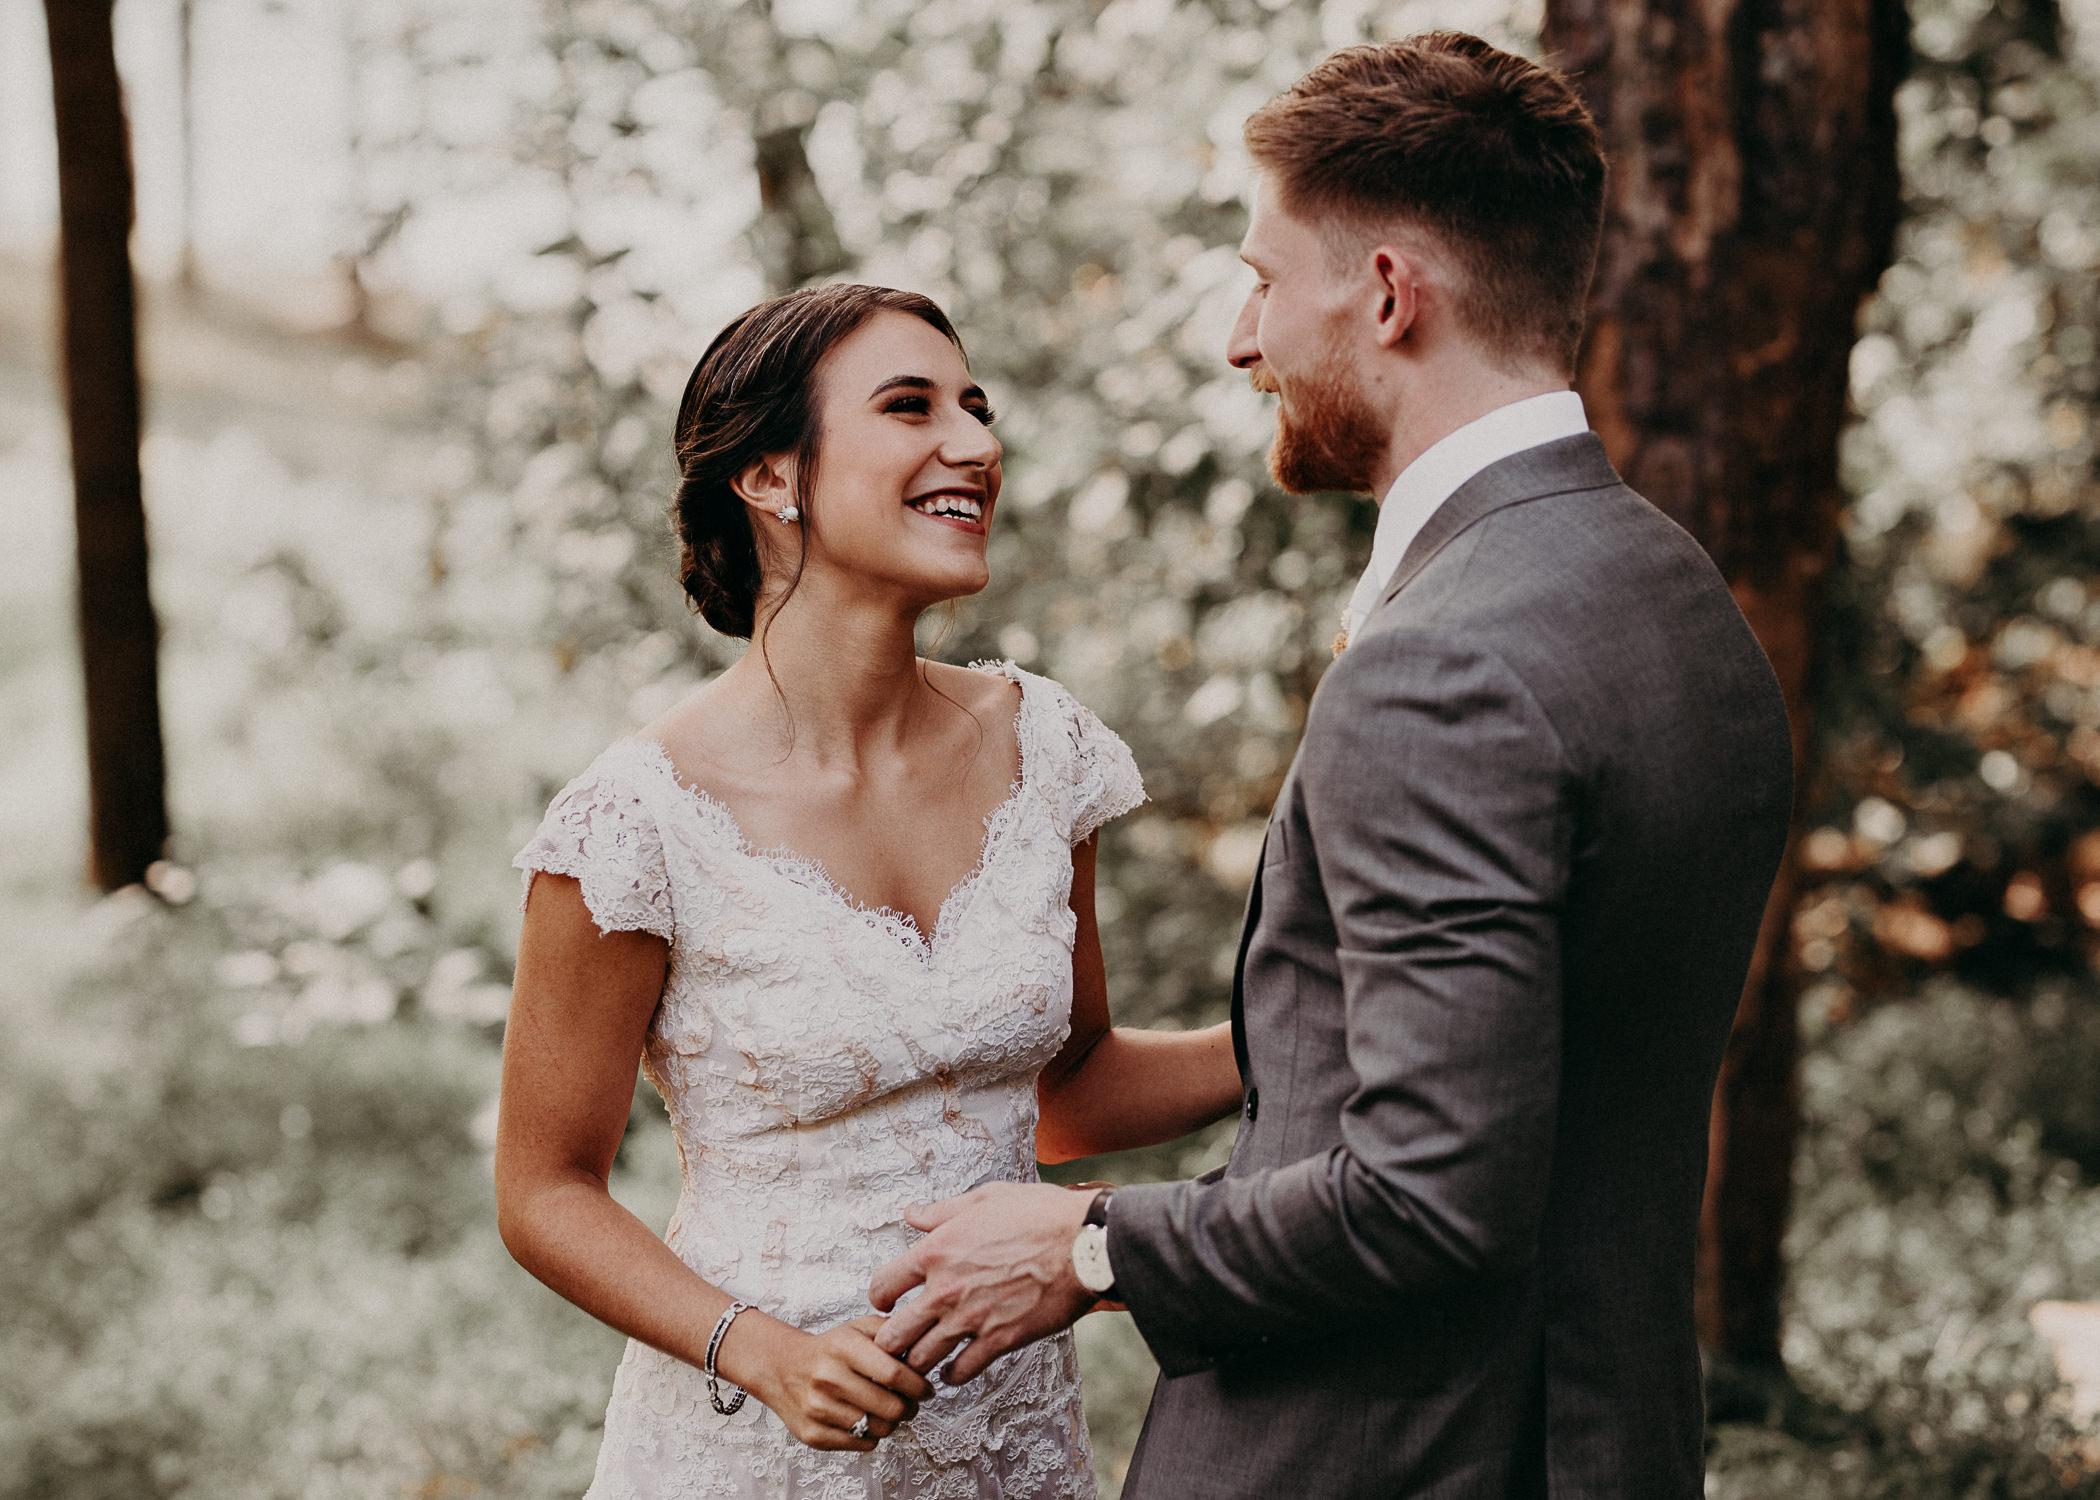 43 Bride & Groom first look before the ceremony on wedding day - Atlanta Wedding Photographer .jpg